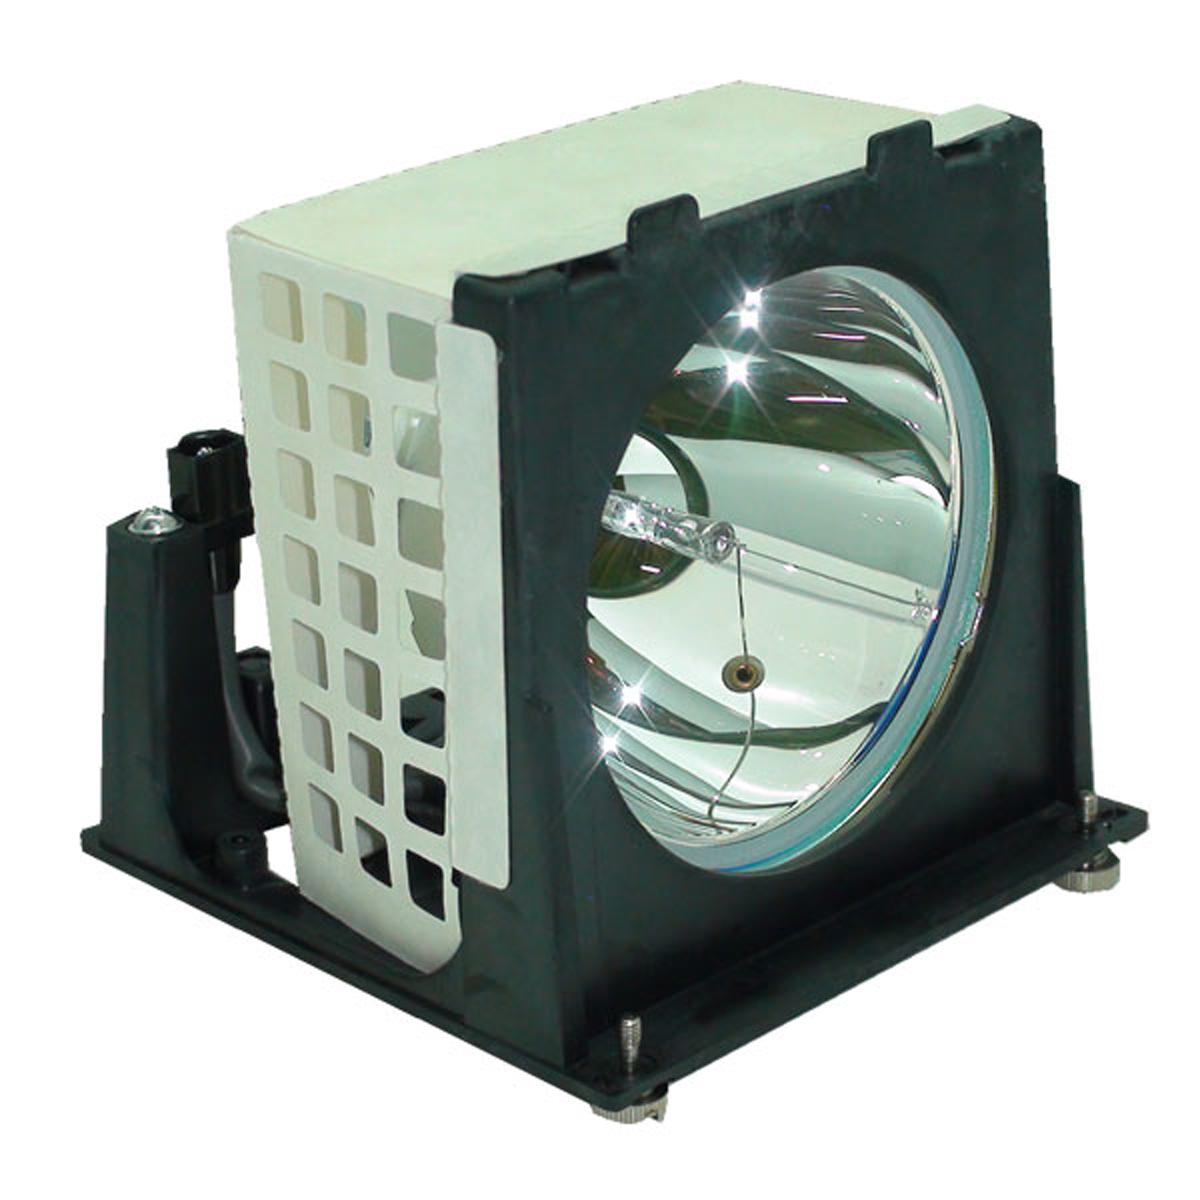 Replacement 915P020010 Bulb Cartridge For Mitsubishi